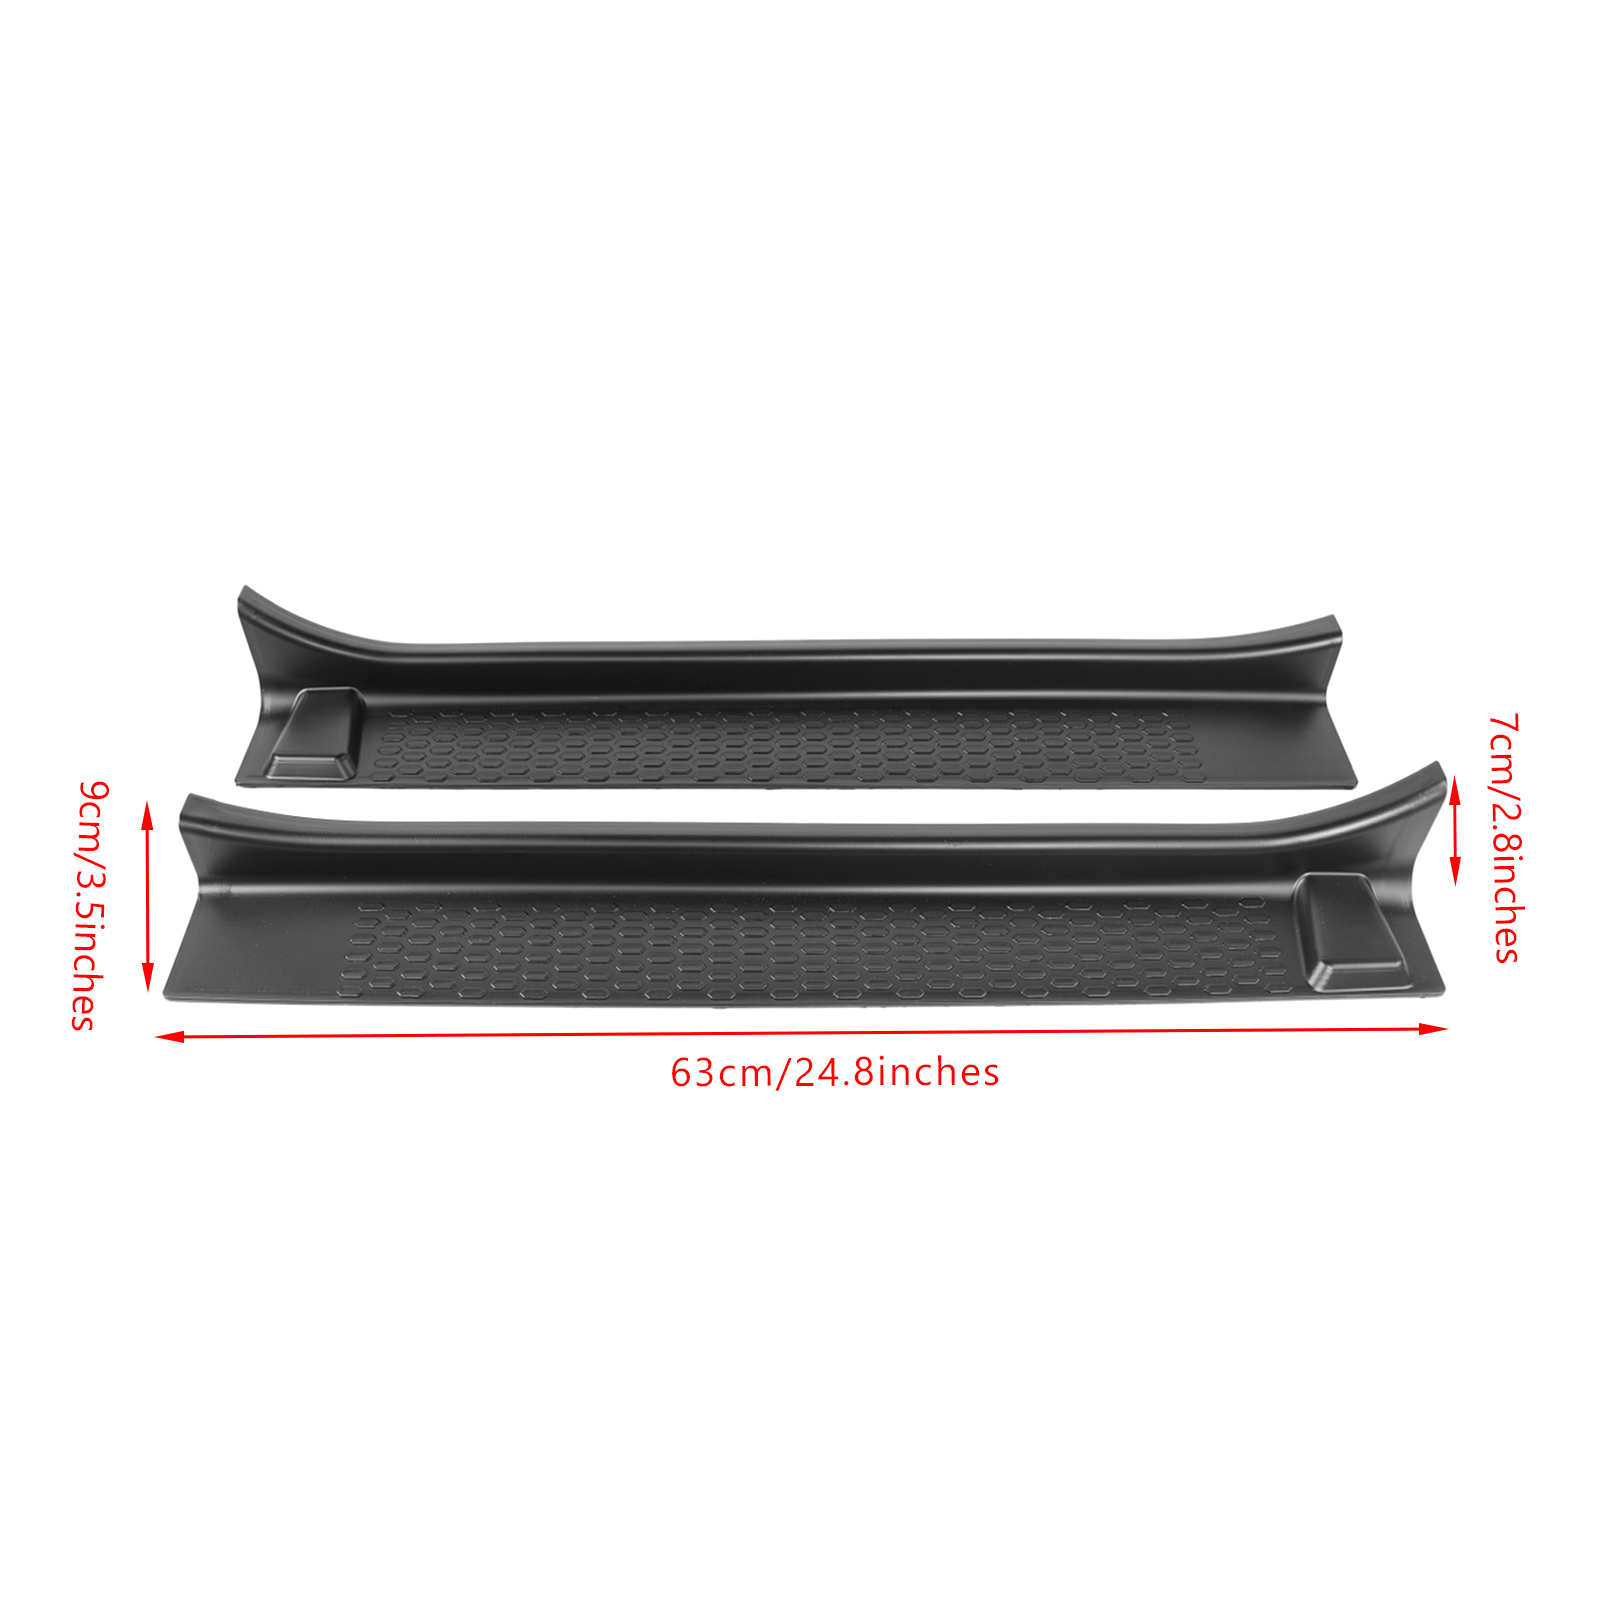 Areyourshop Black Car Scuff Plate Door Sill Guard Pedal For 2018-2020 Wrangler JL JT 2-Door